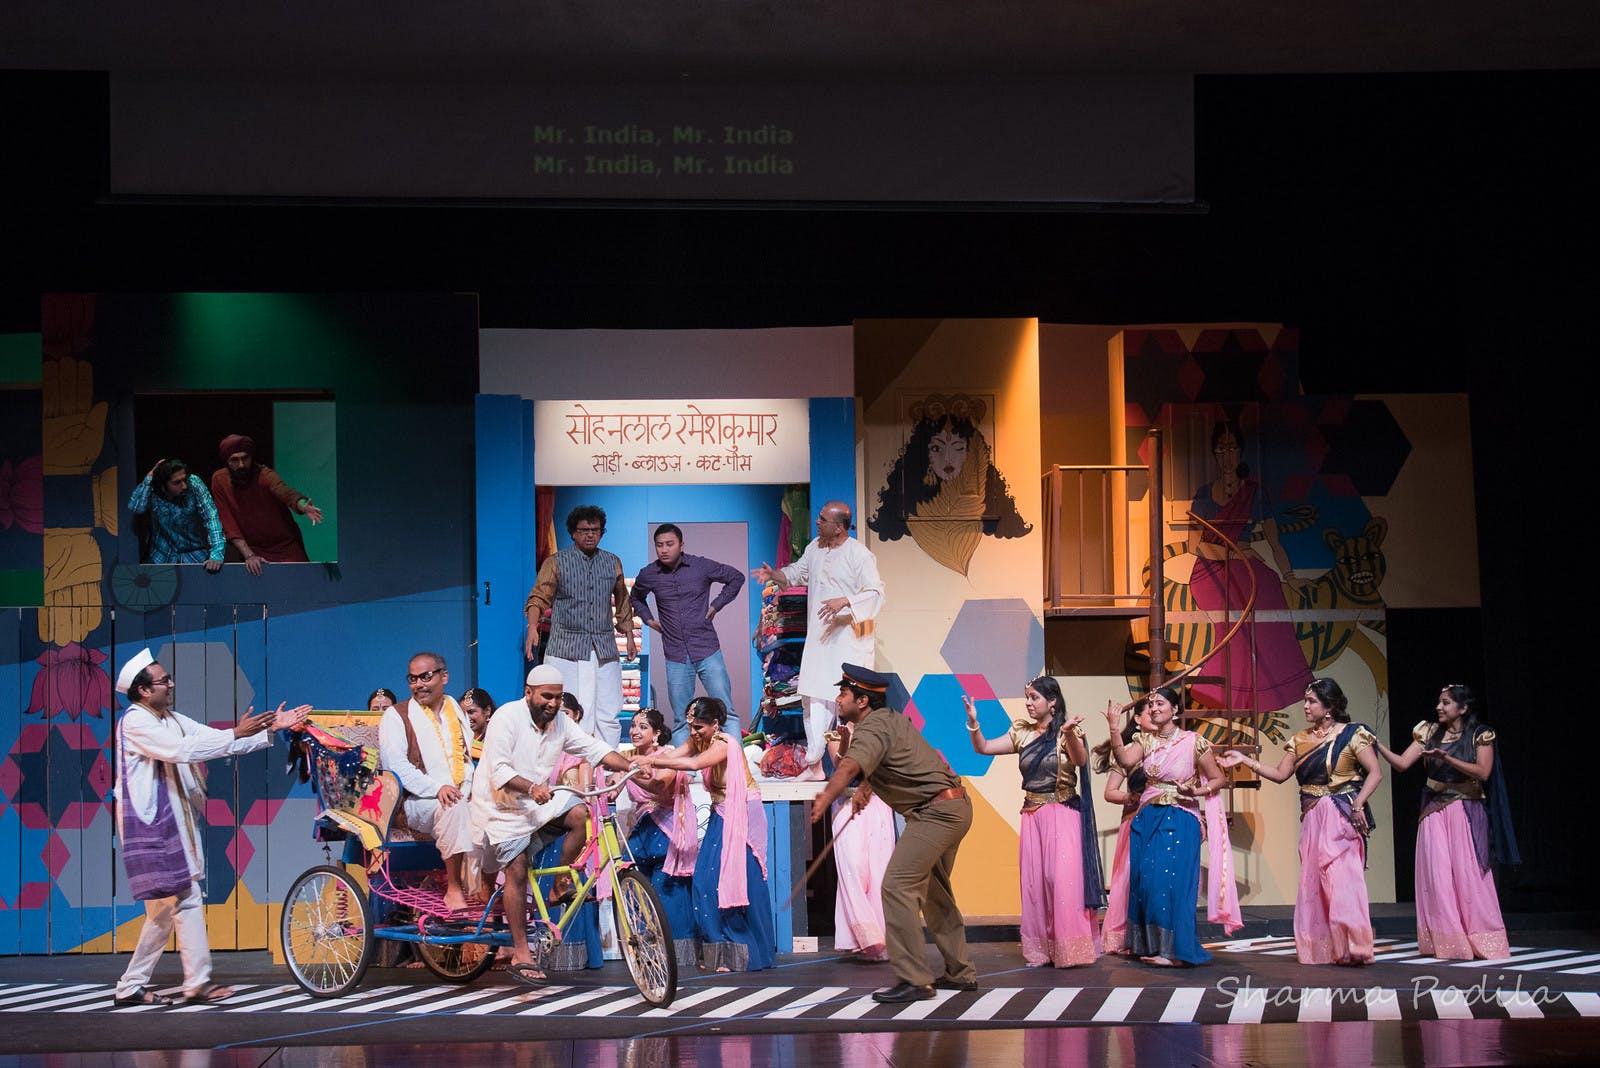 <p><em>Naatak production of &quot;Mr. India.&quot; Photo by Sharma Podila.</em></p>